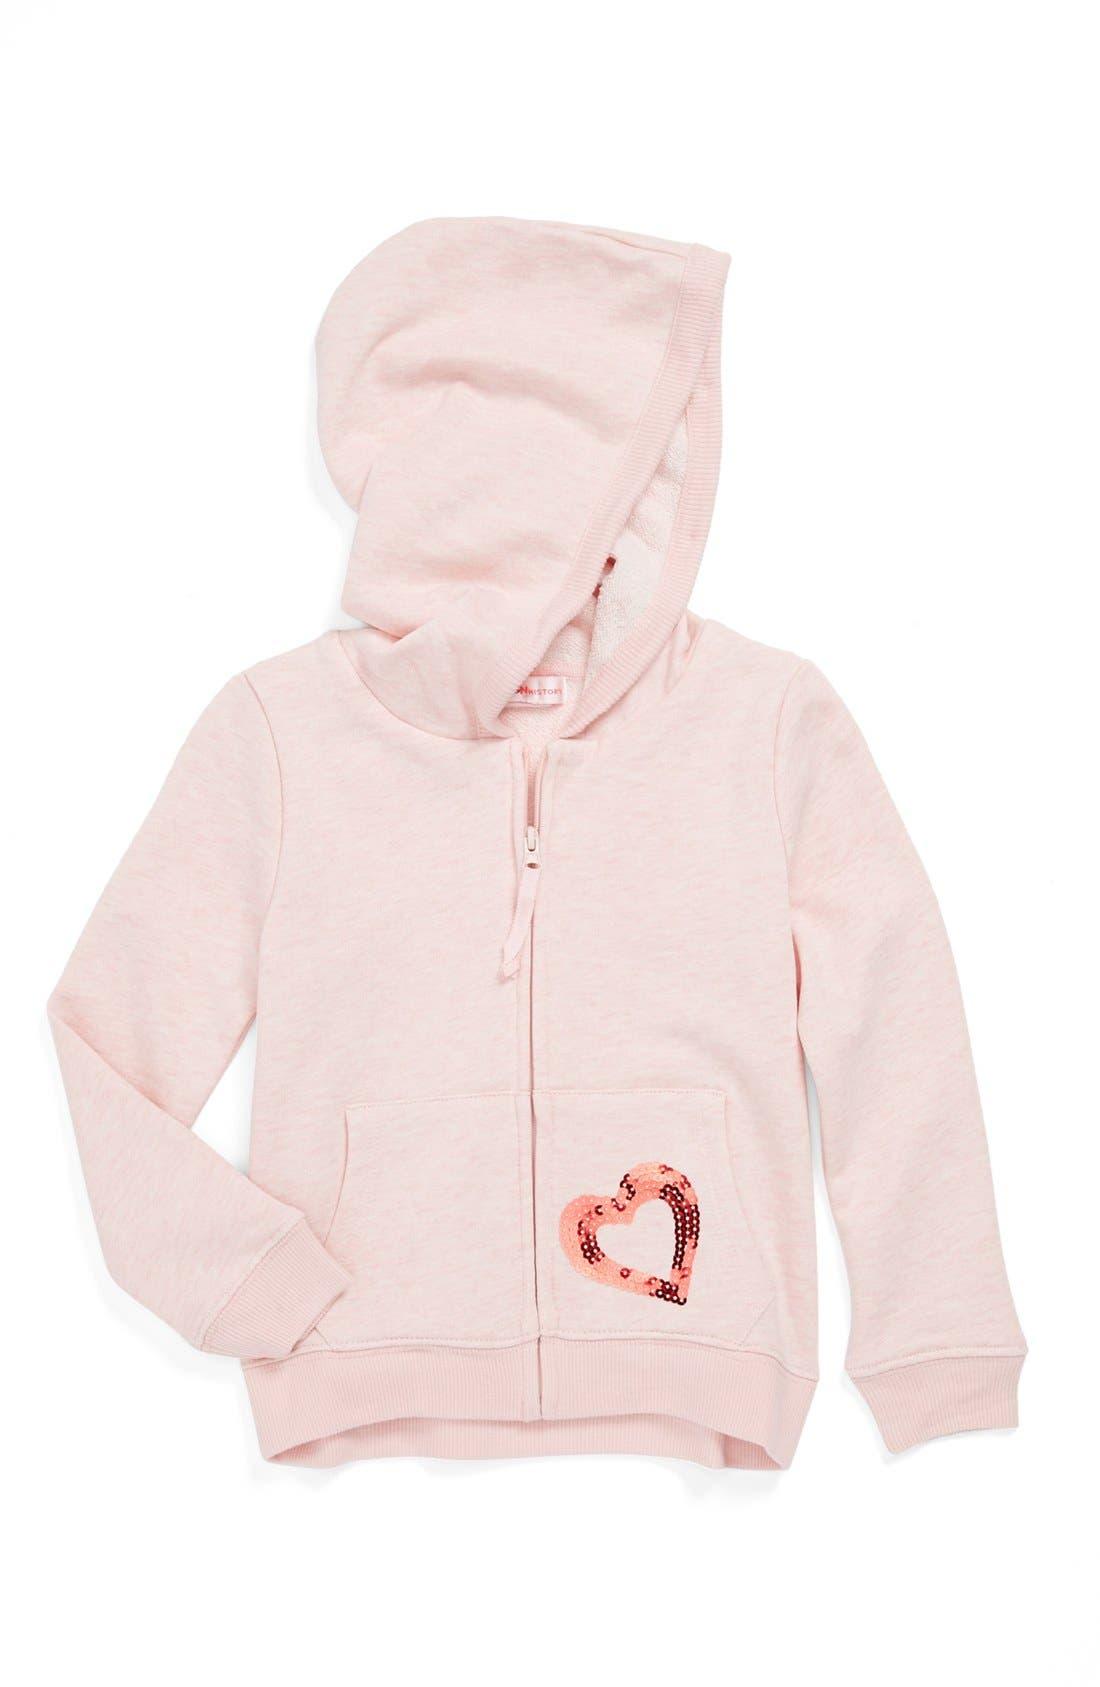 Alternate Image 1 Selected - Design History Zip Hoodie (Toddler Girls)